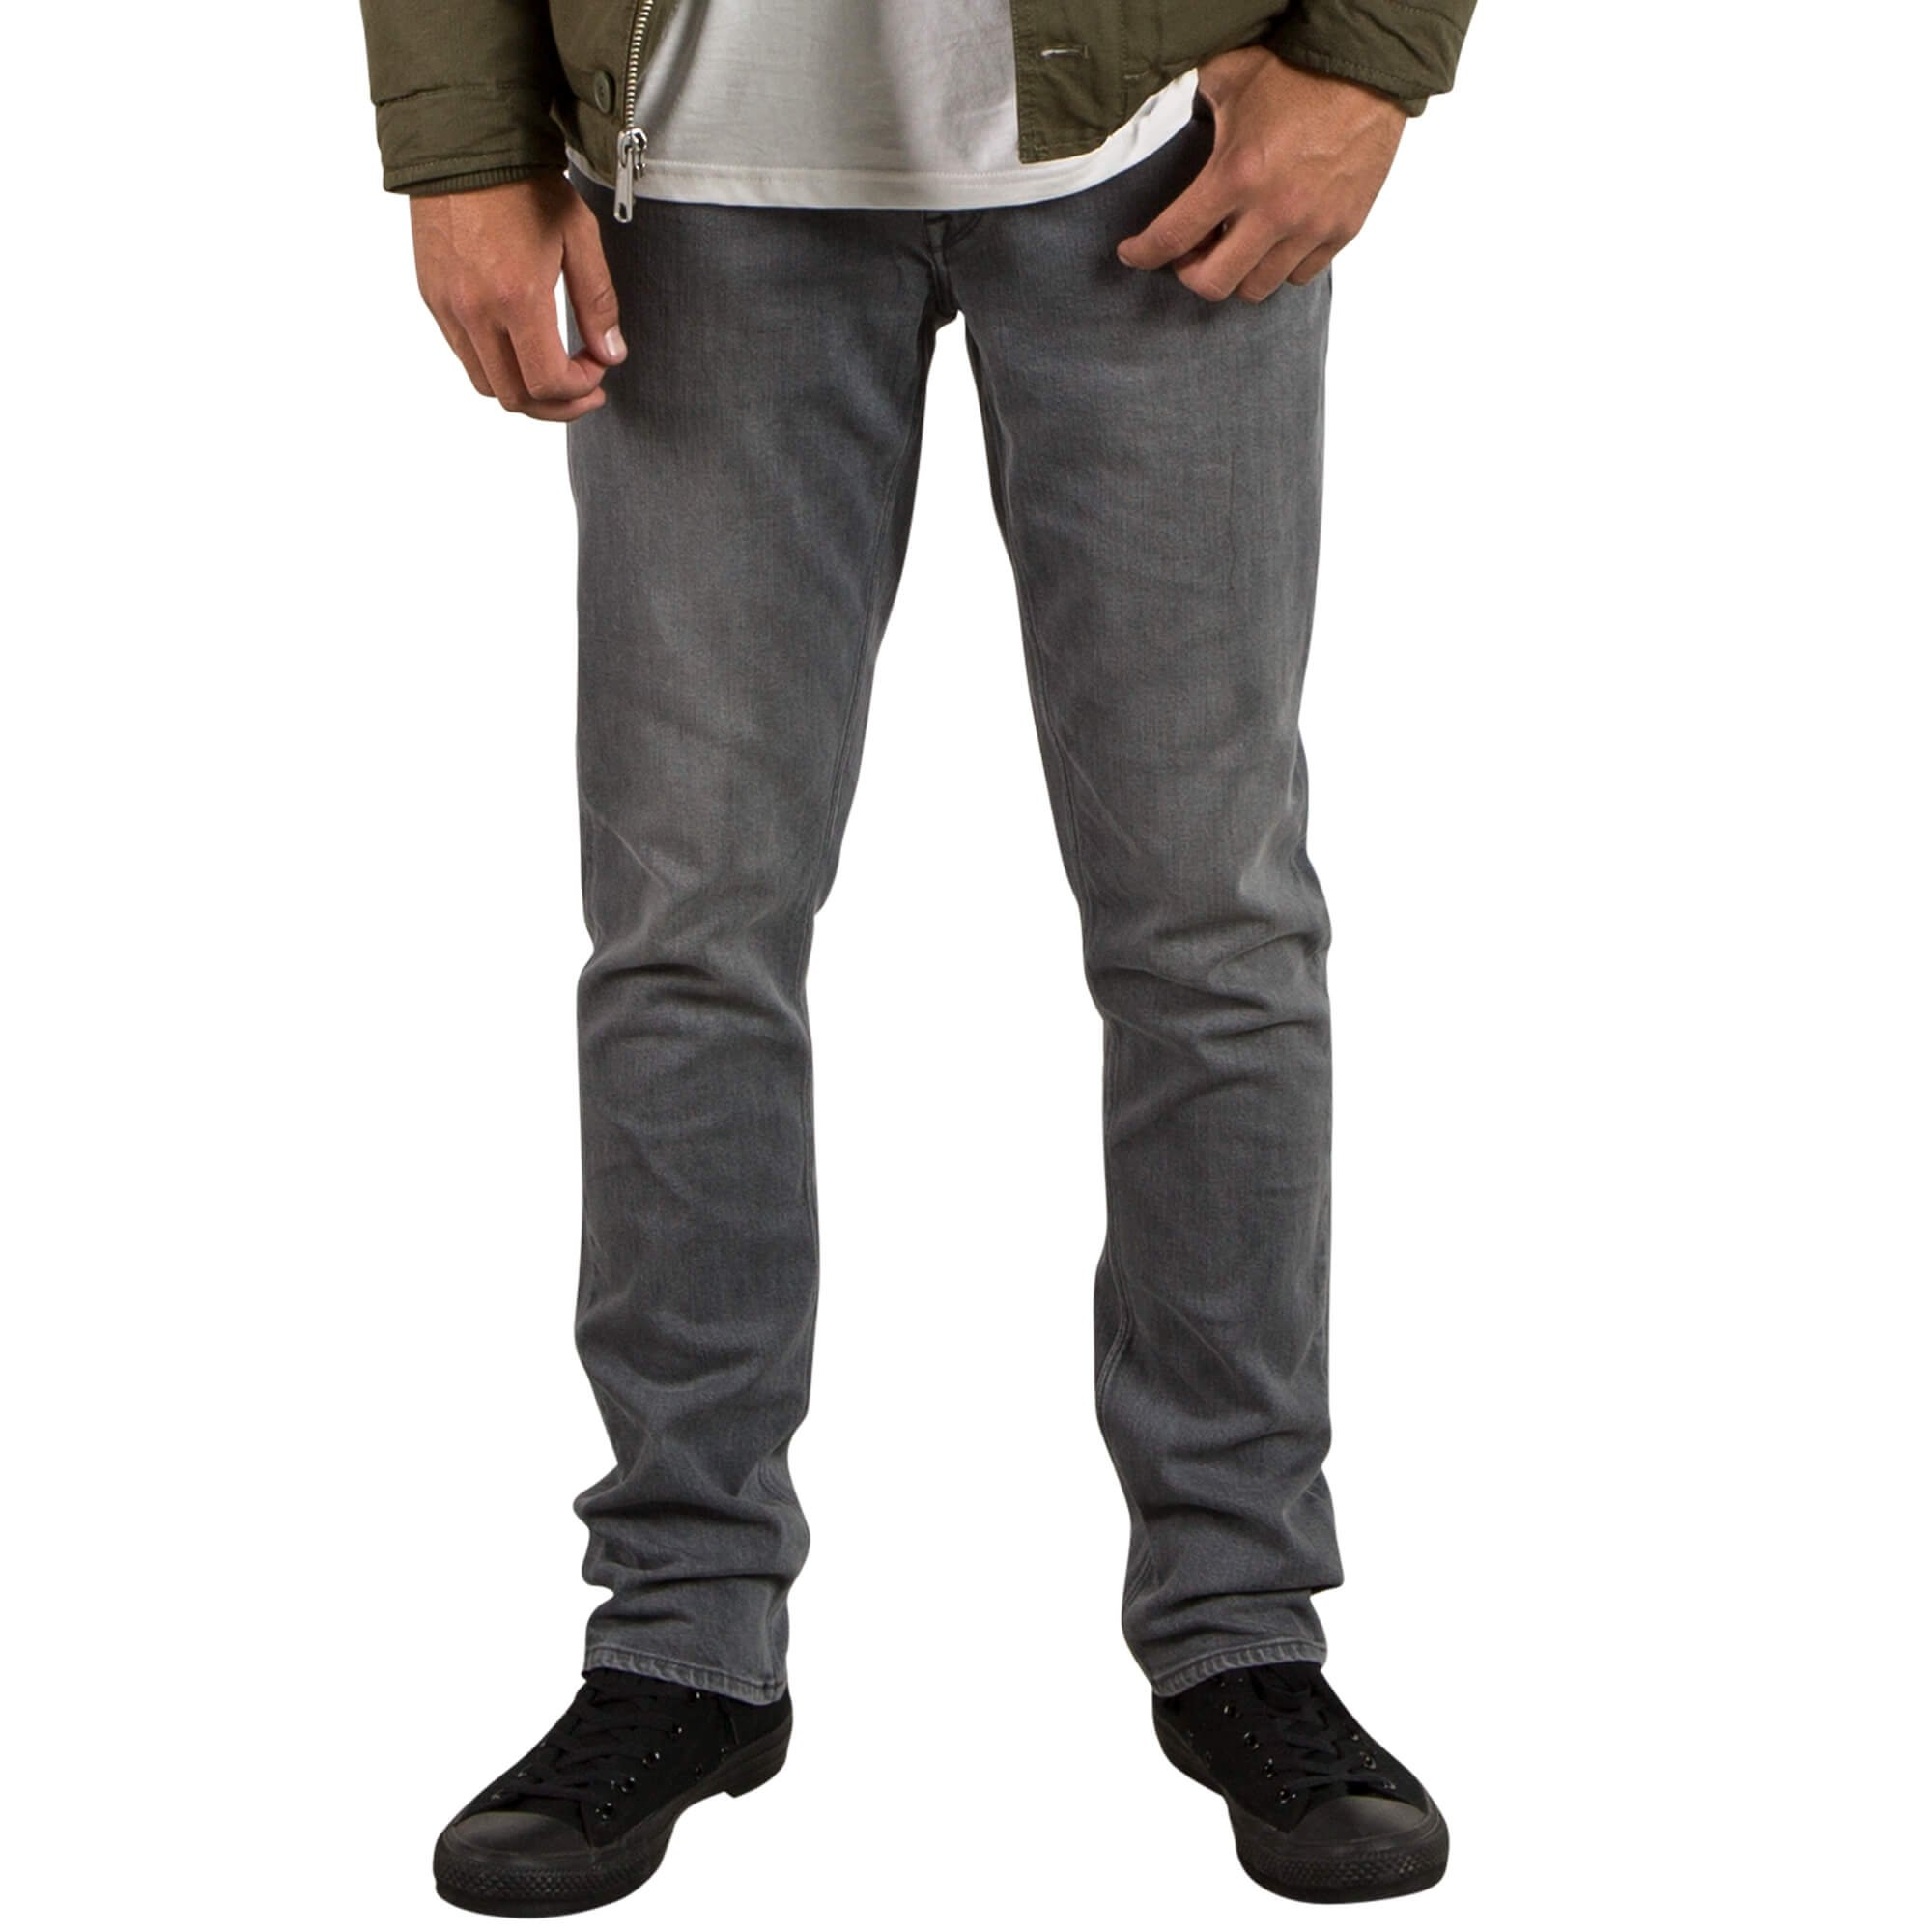 Volcom Men's Vorta Slim Fit Stretch Denim Jean, Power Grey, 36X34